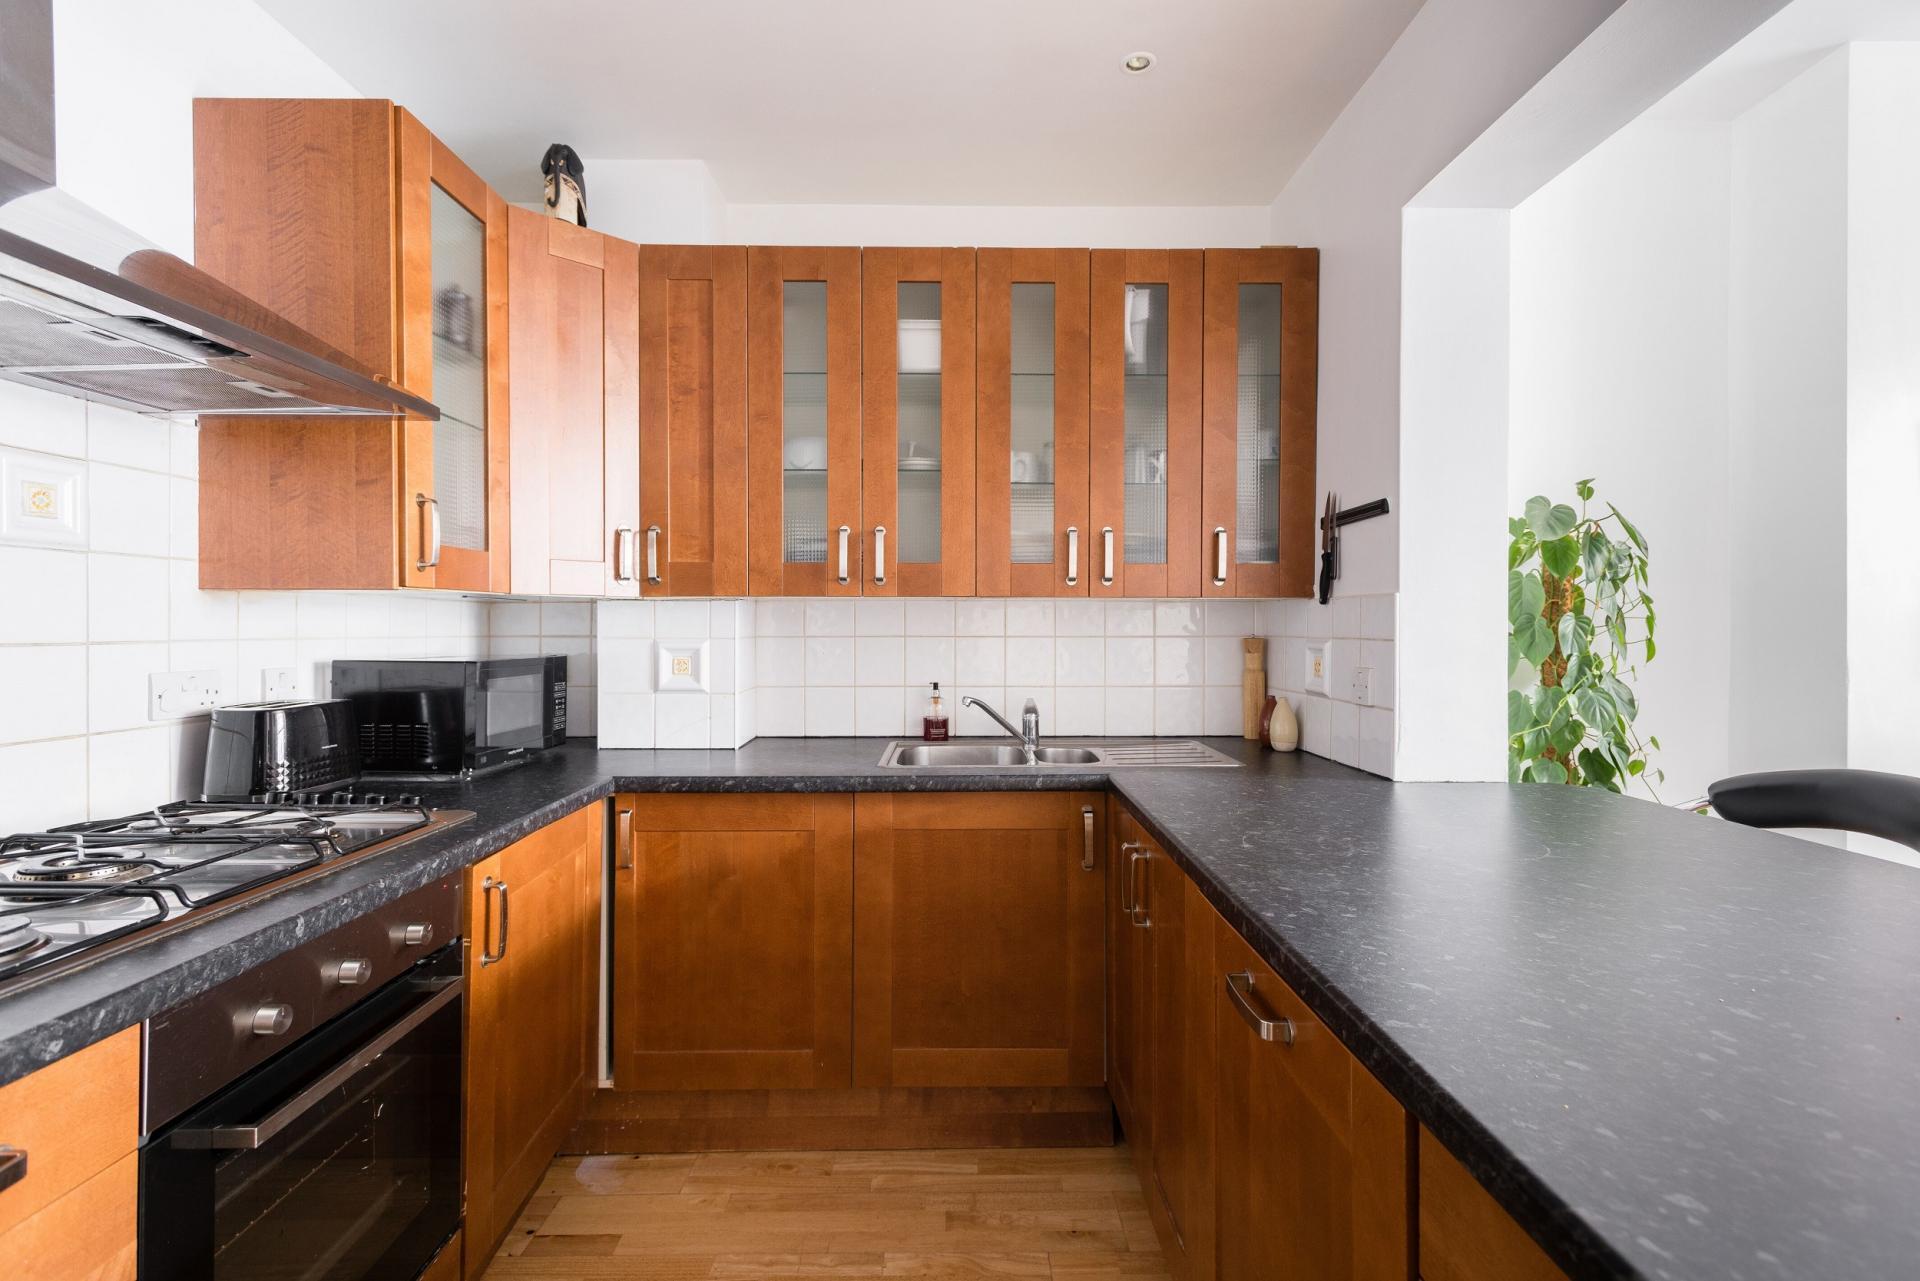 Kitchen at The Bayswater Gardens House, Bayswater, London